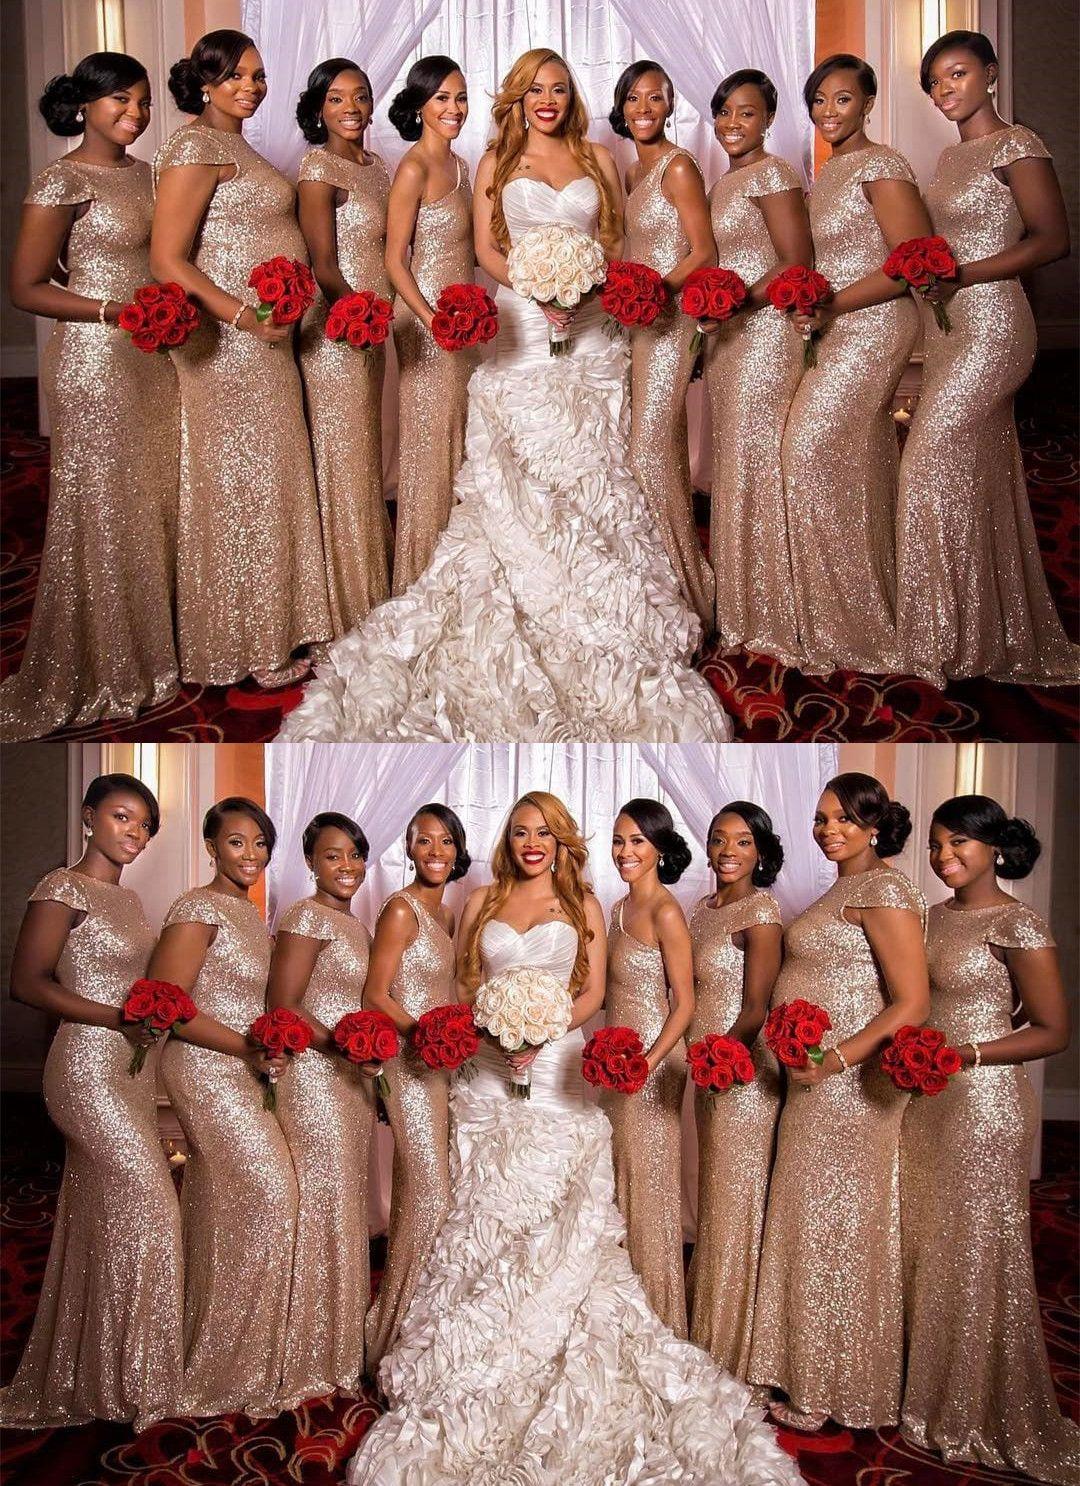 Chic Mermaid Long Sequins Gold Bridesmaid Dress With Cap Sleeves Mermaid Bridesmaid Dresses Gold Bridesmaid Dresses Rose Gold Bridesmaid Dress [ 1486 x 1080 Pixel ]